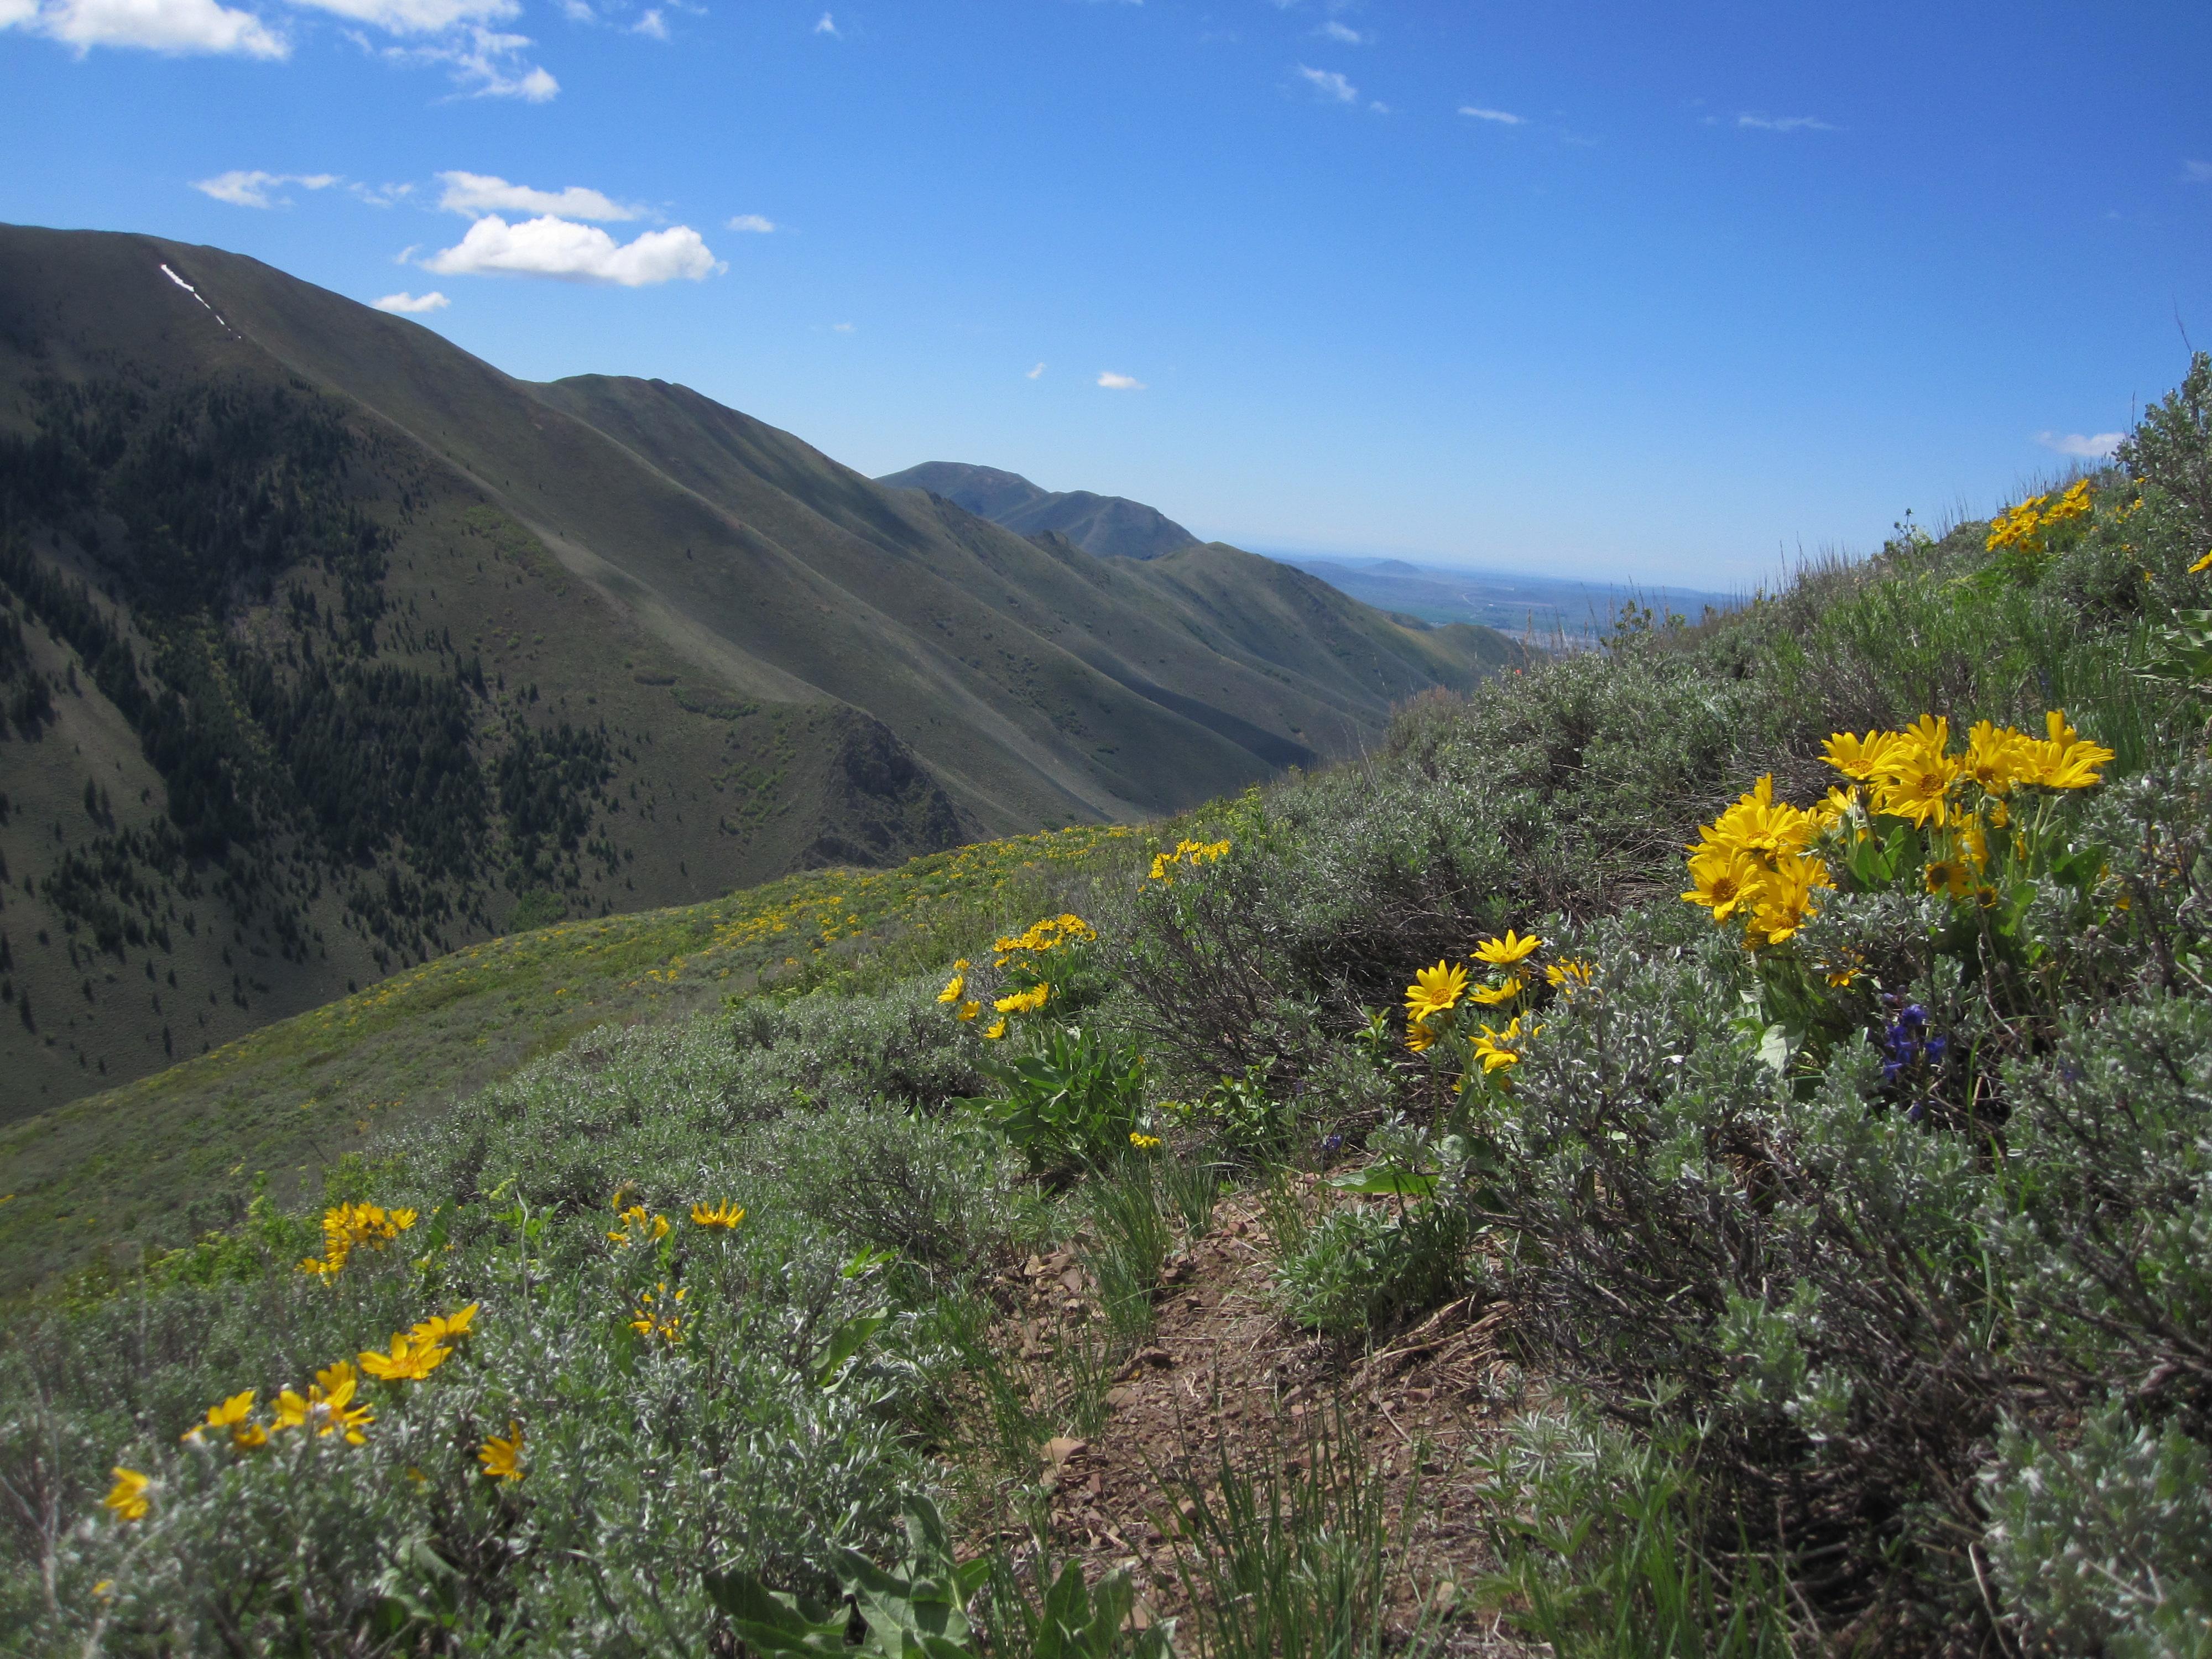 Arrowleaf Balsamroot is in bloom in parts of the valley.